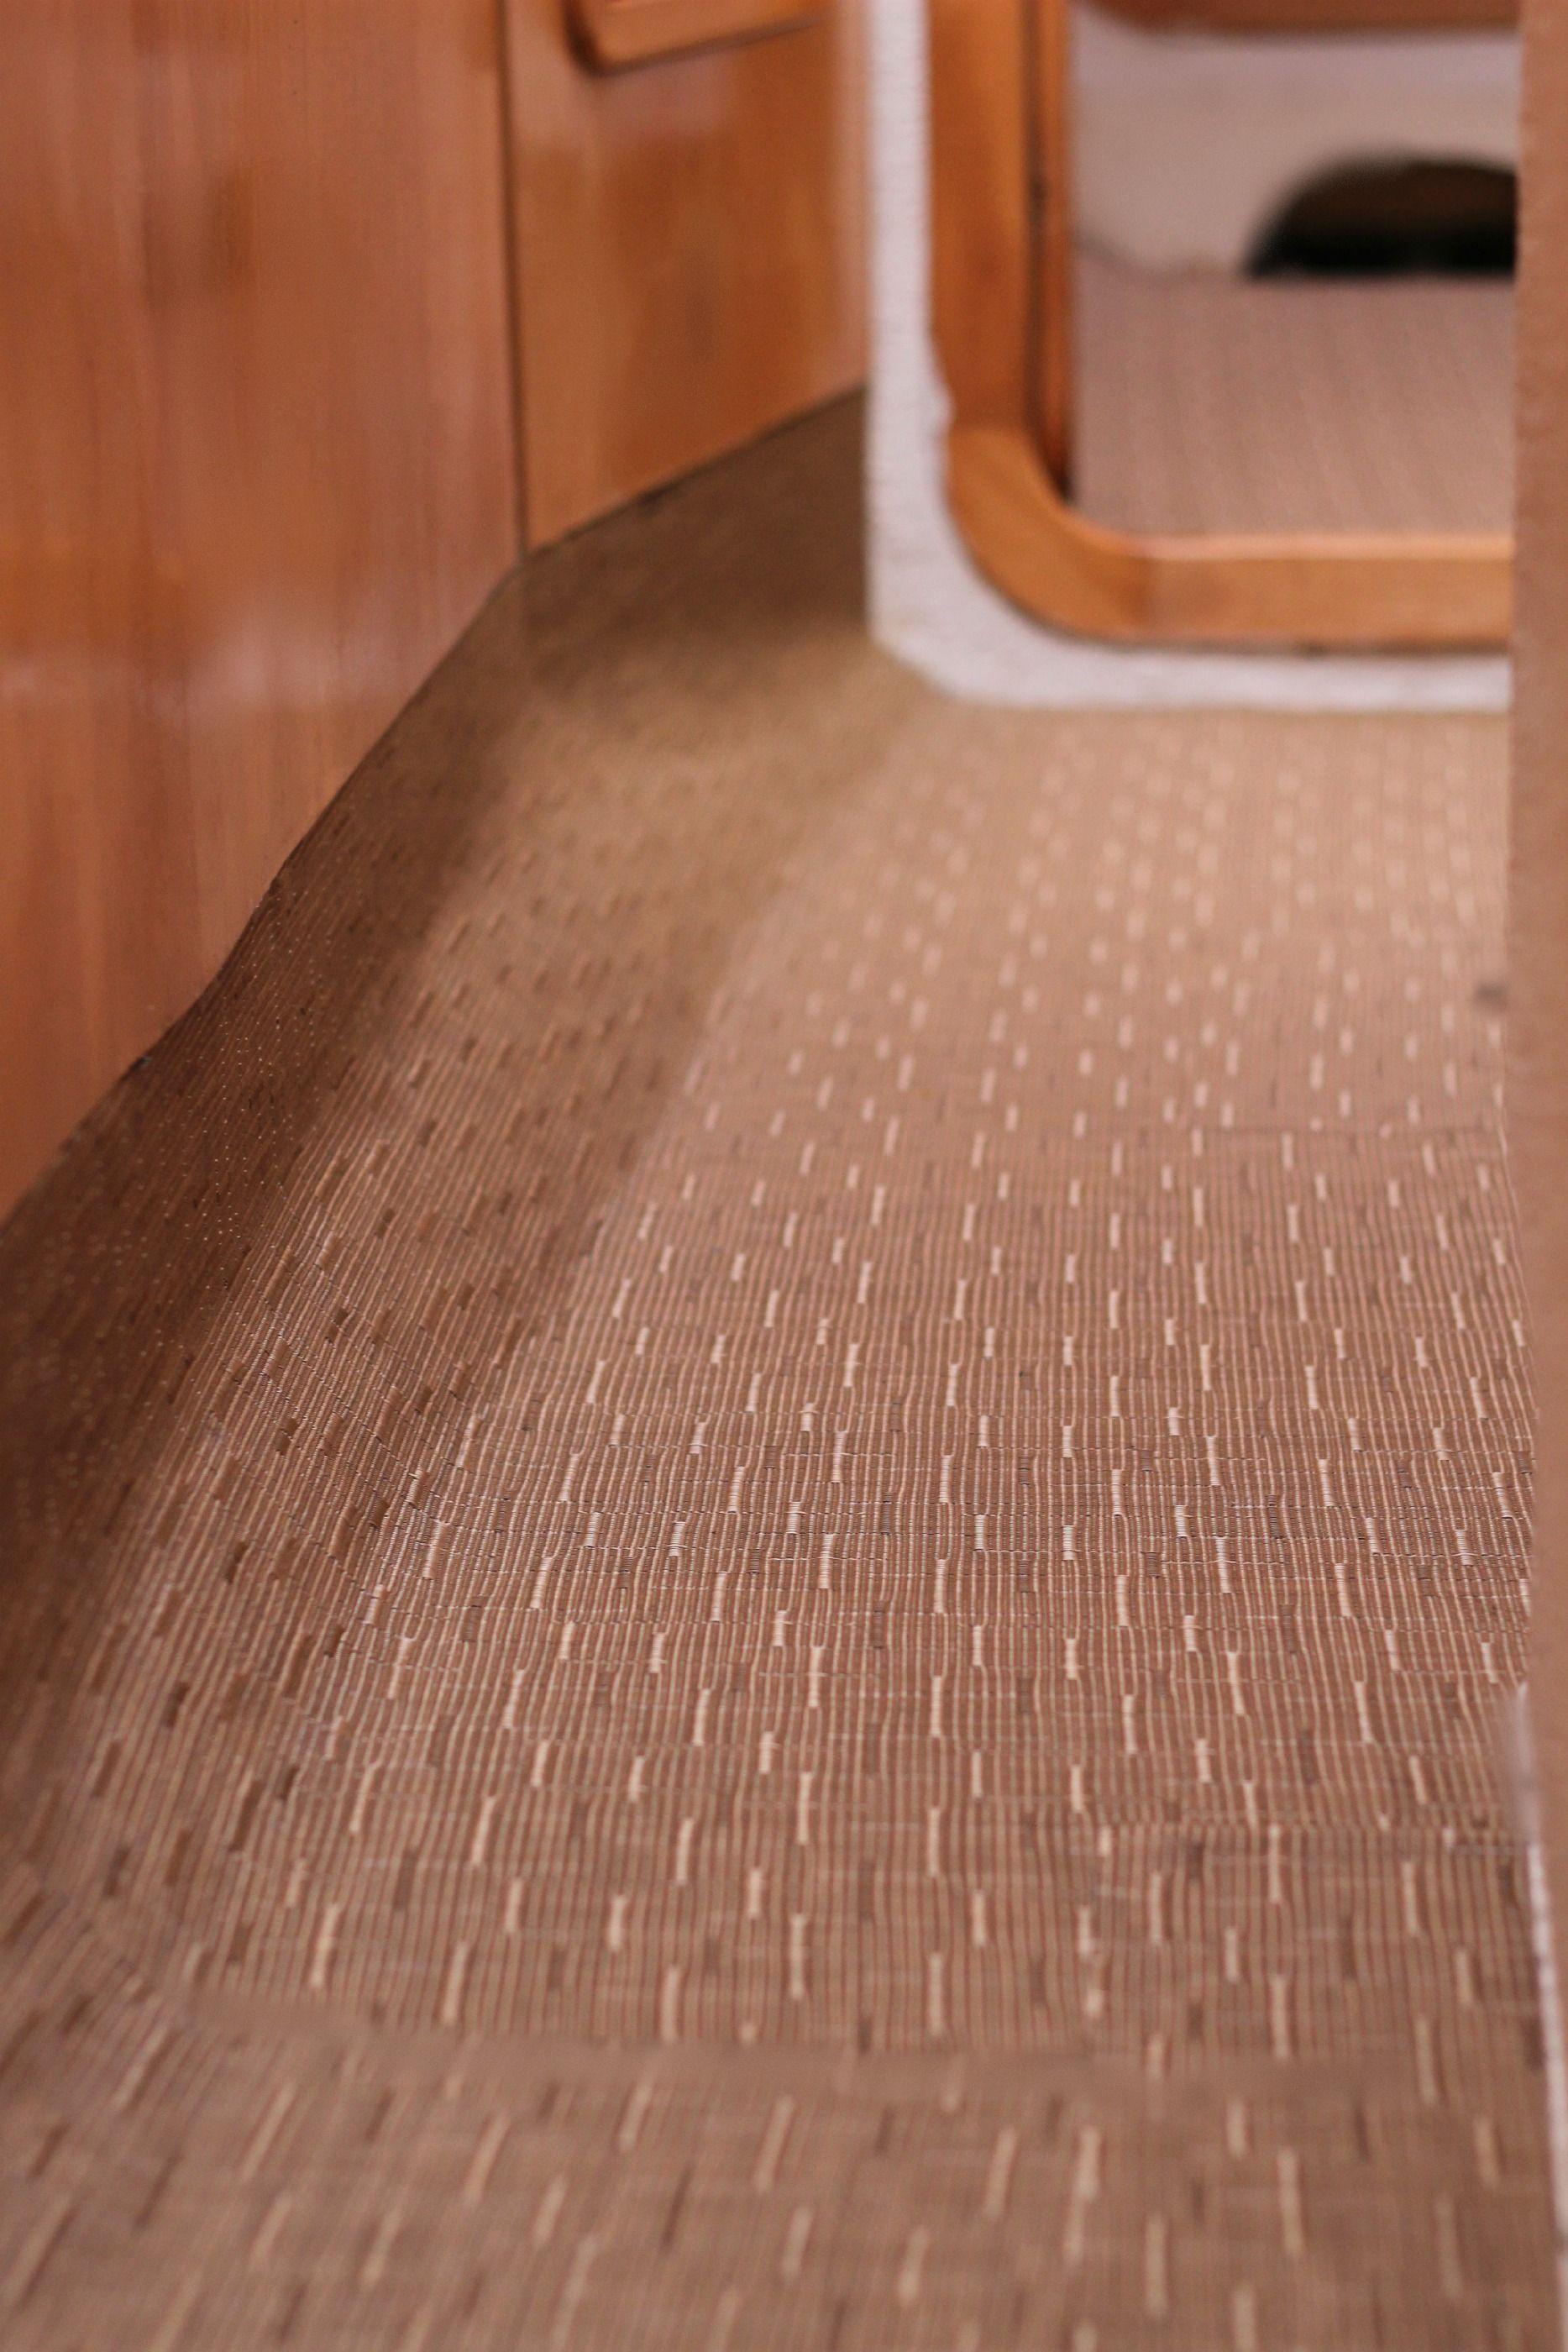 Plynyl flooring its a glue down woven vinyl